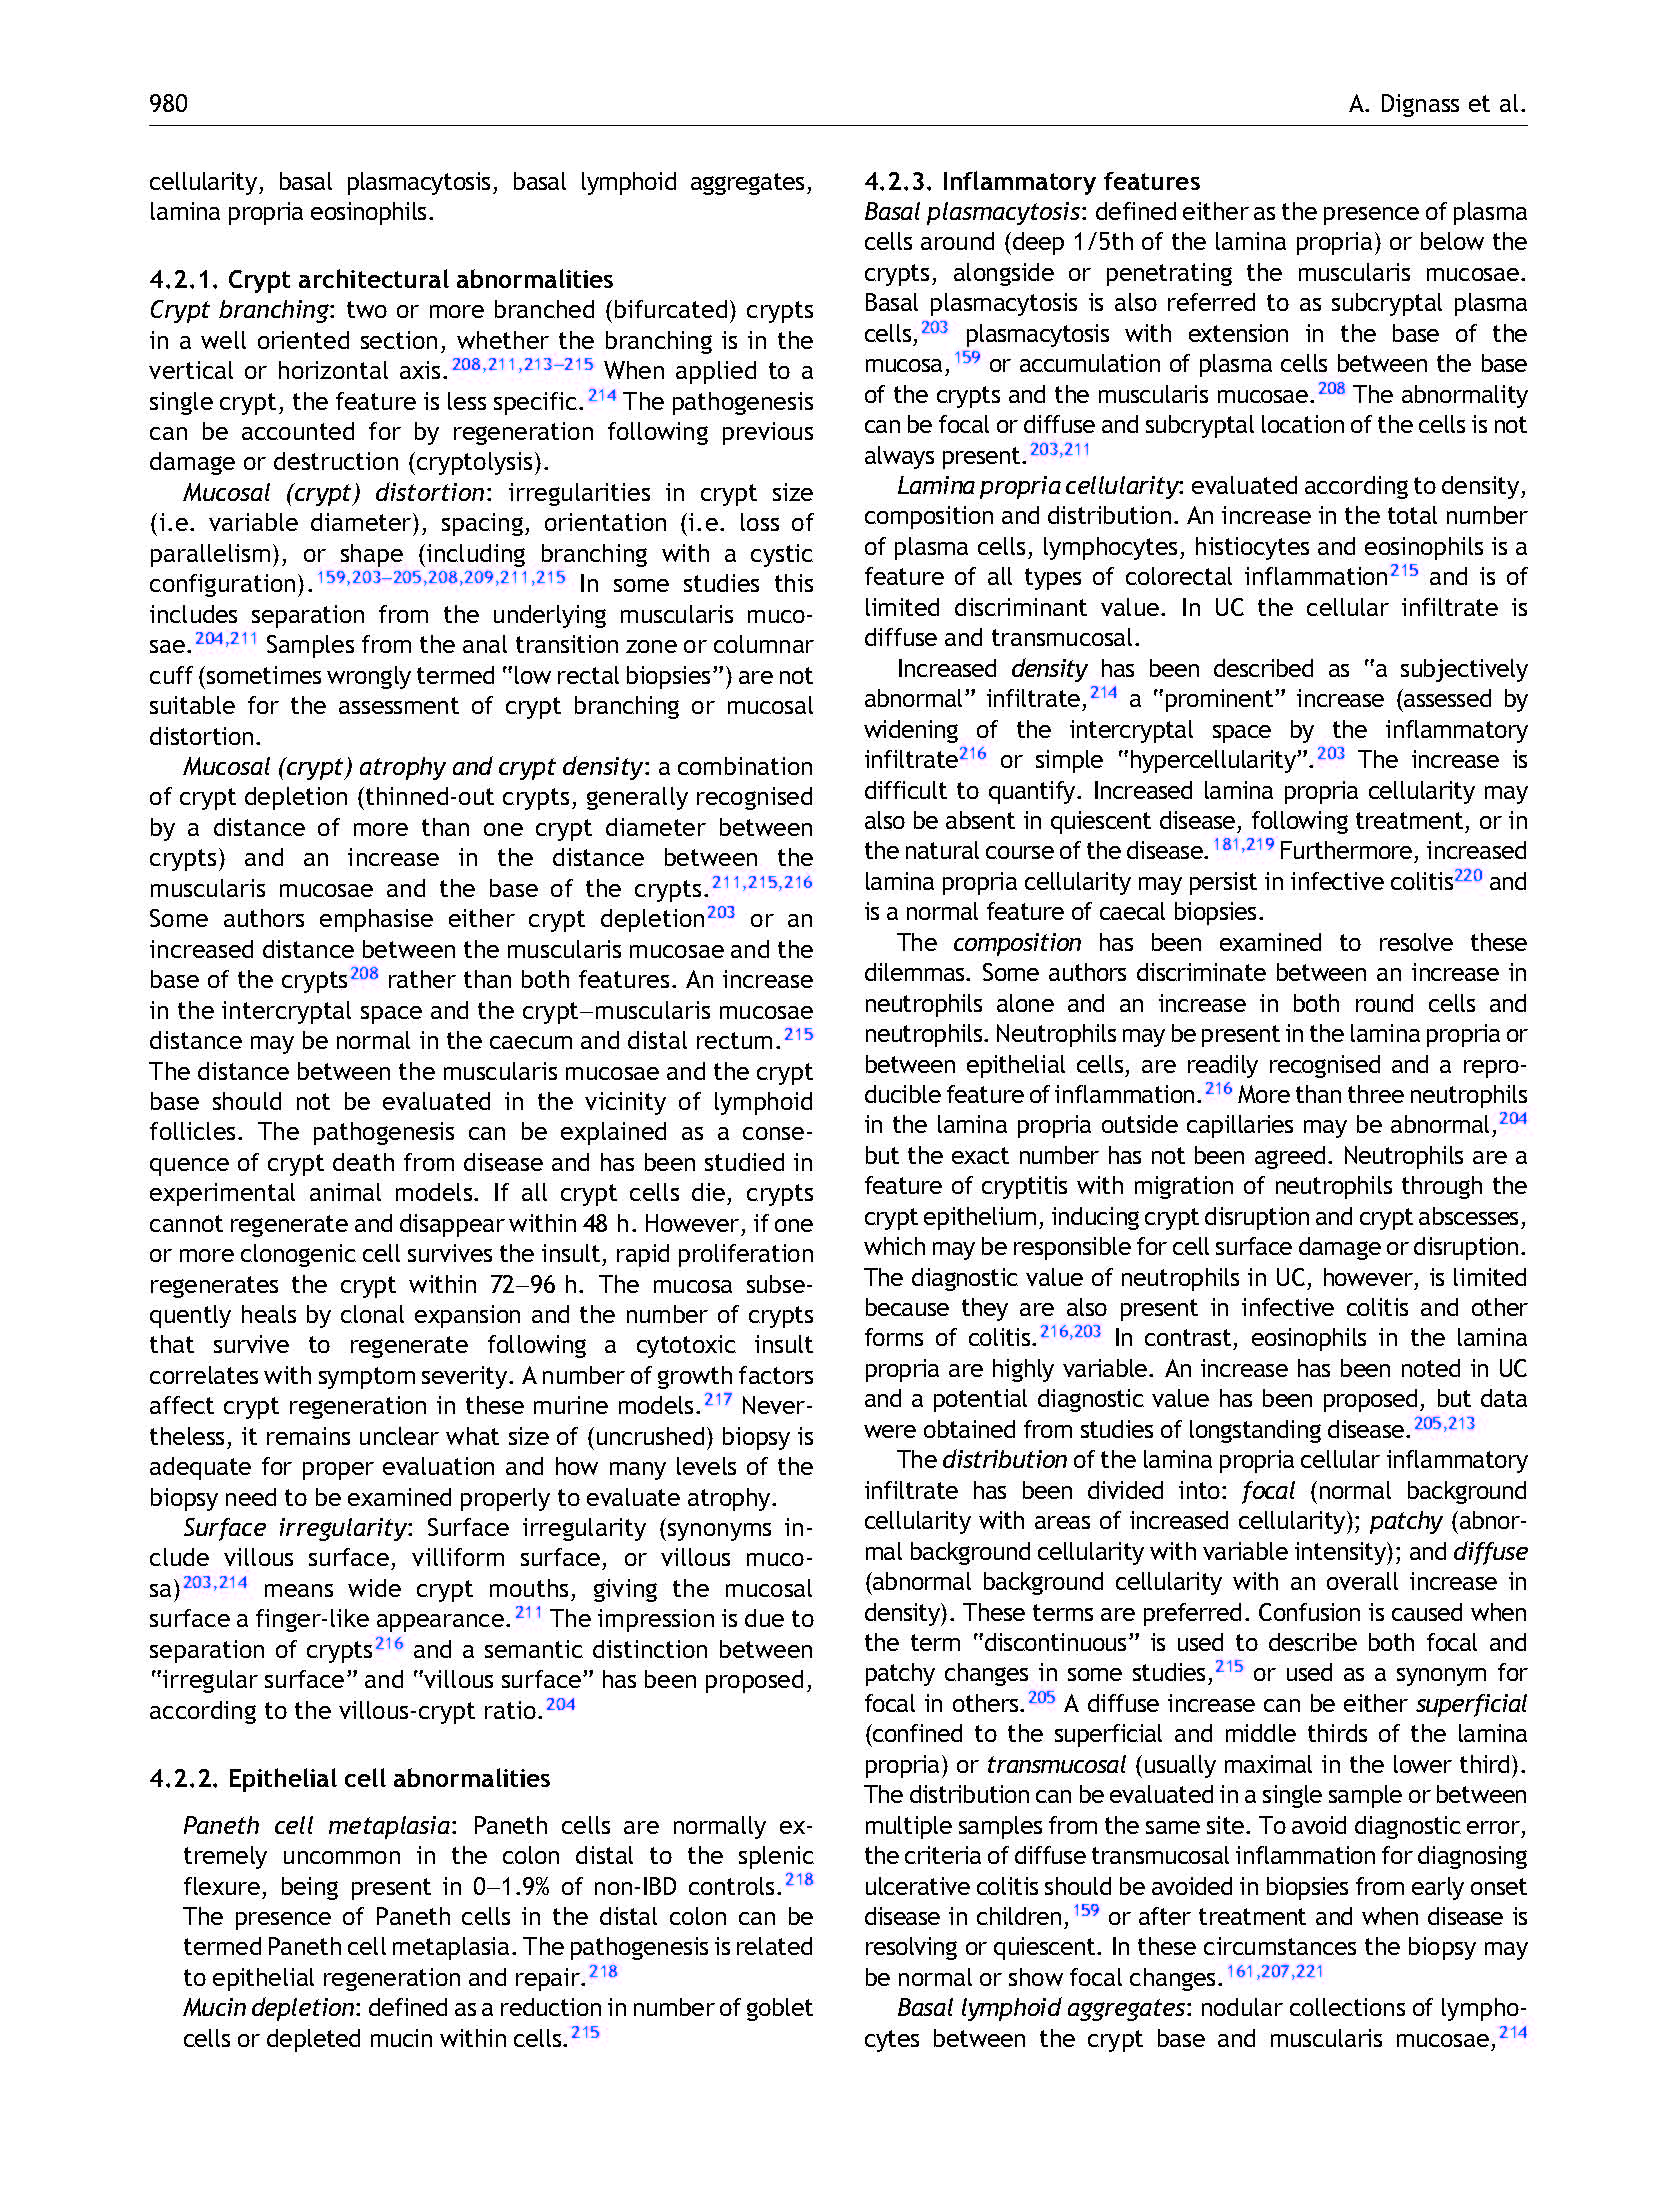 2012-ECCO第二版-欧洲询证共识:溃疡性结肠炎的诊断和处理—定义与诊断_页面_16.jpg